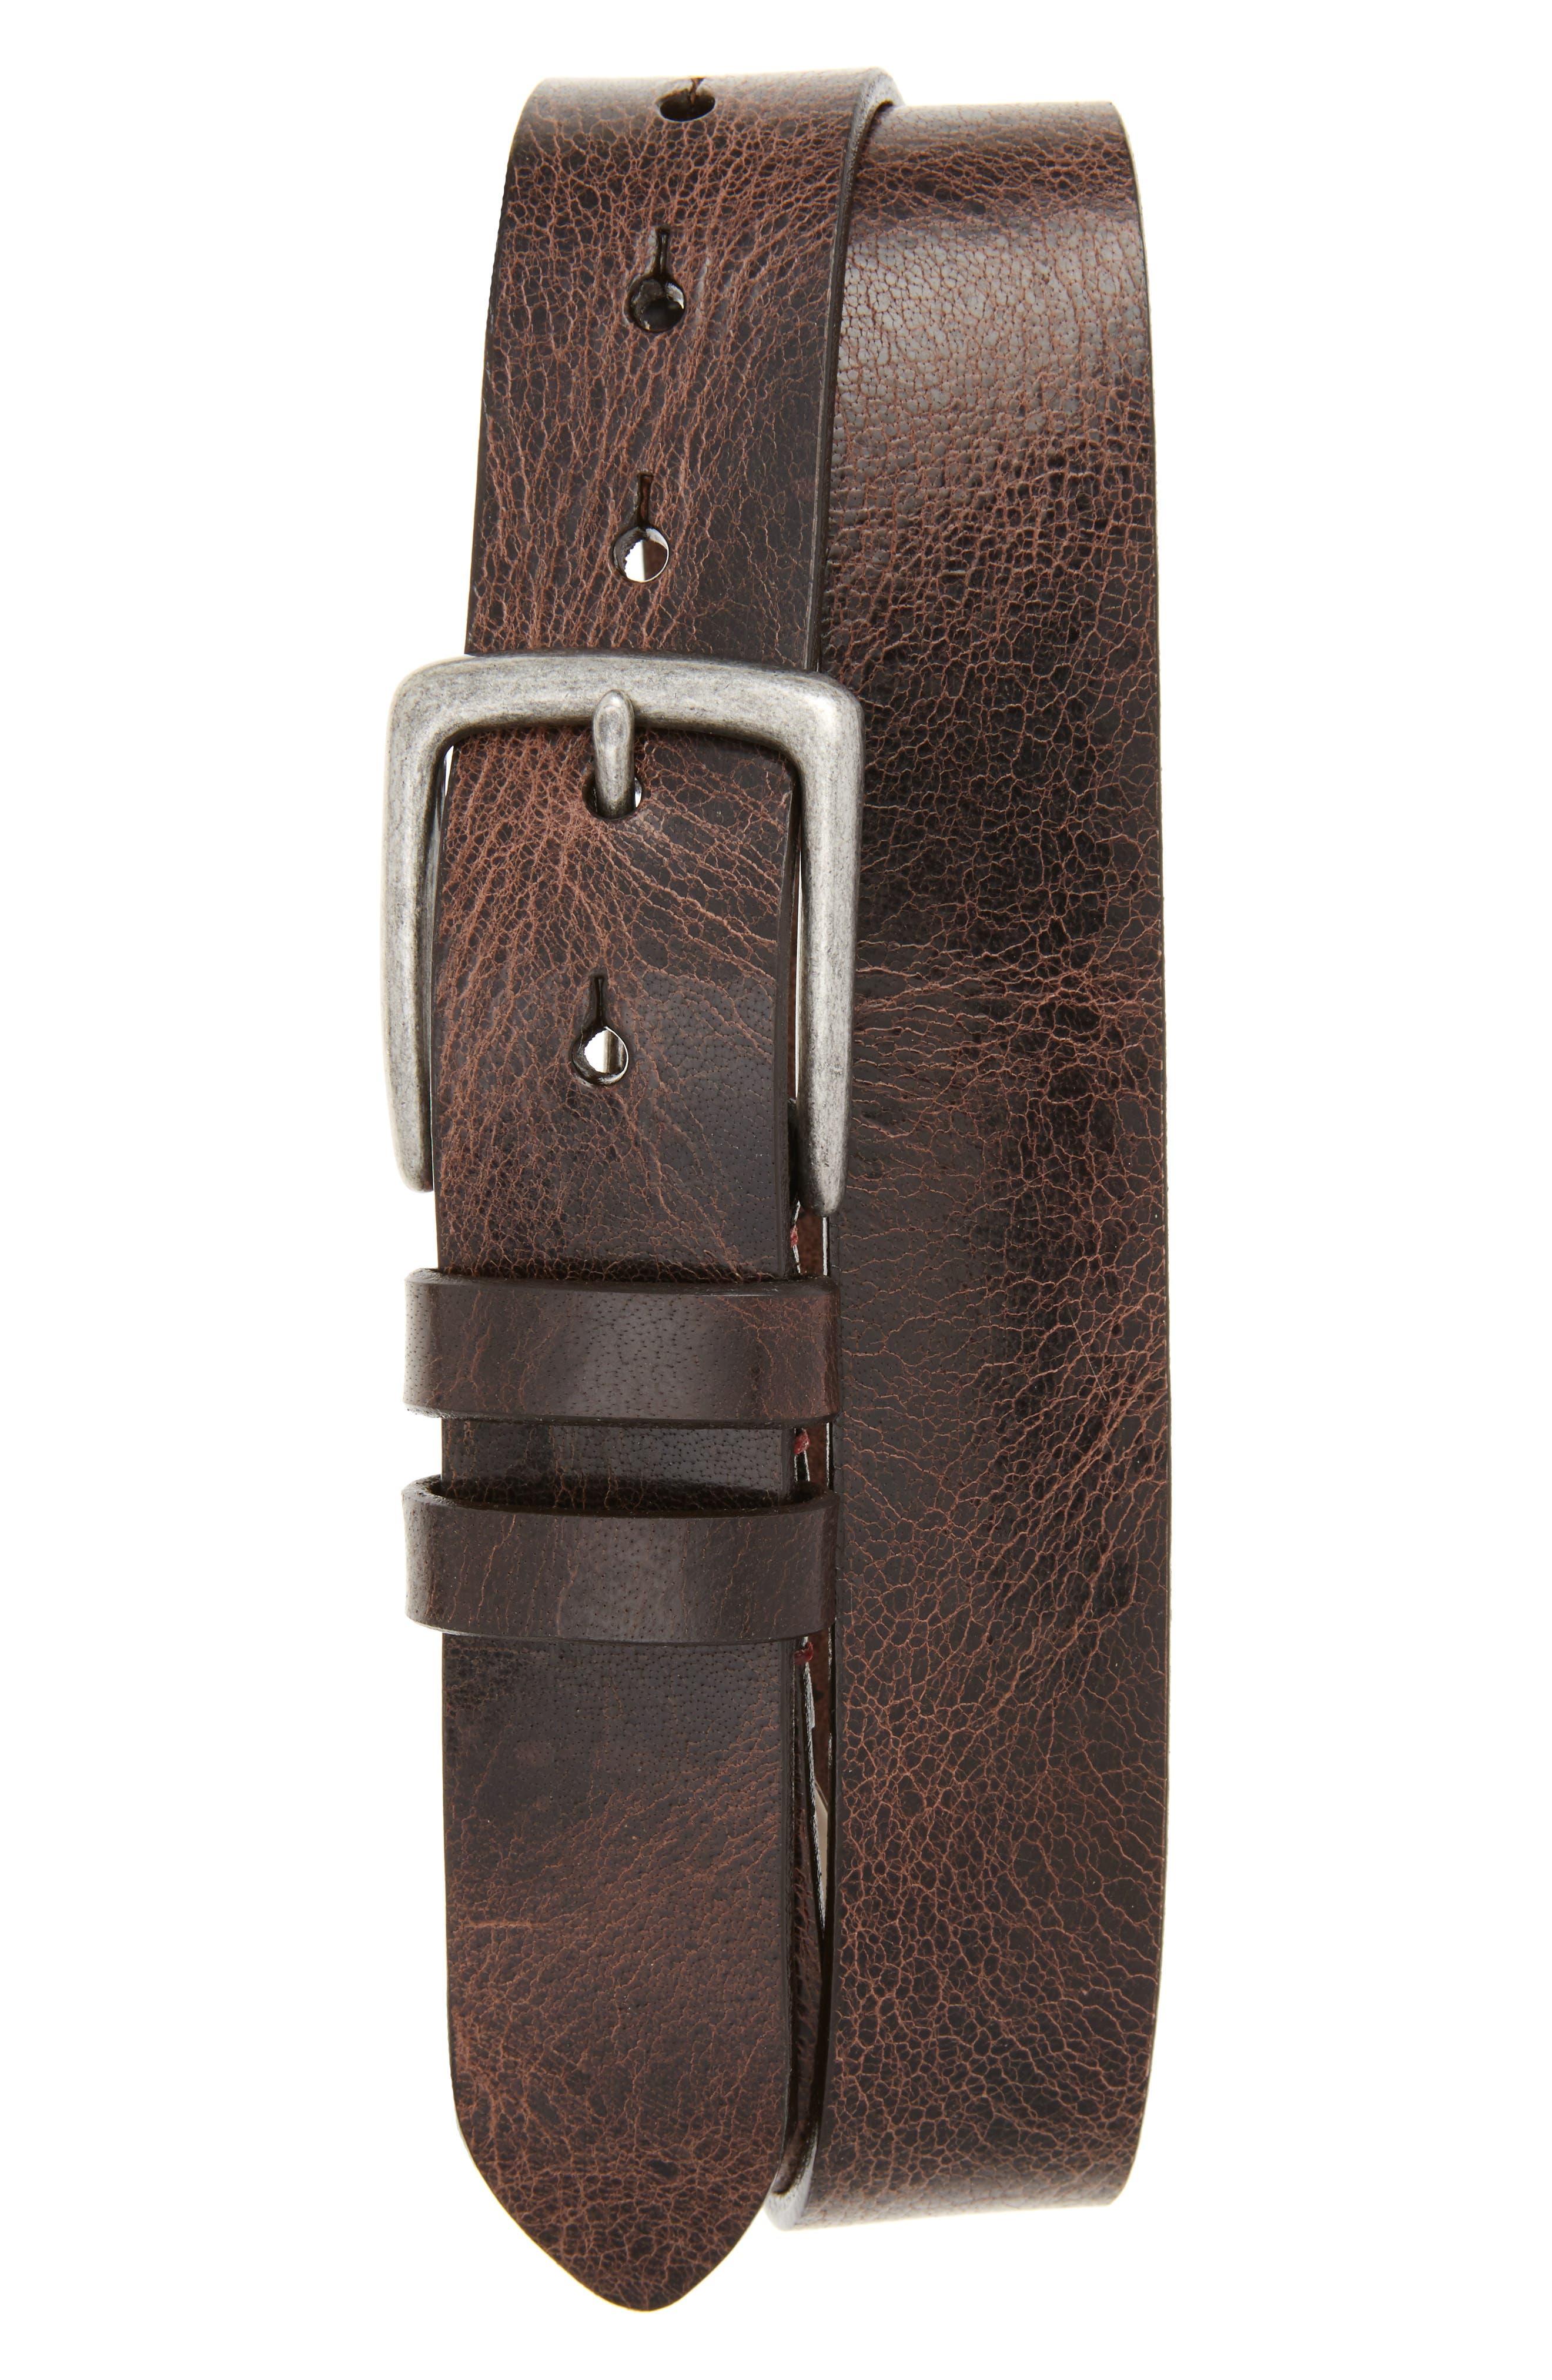 Main Image - Torino Belts Antiqued Polished Harness Leather Belt